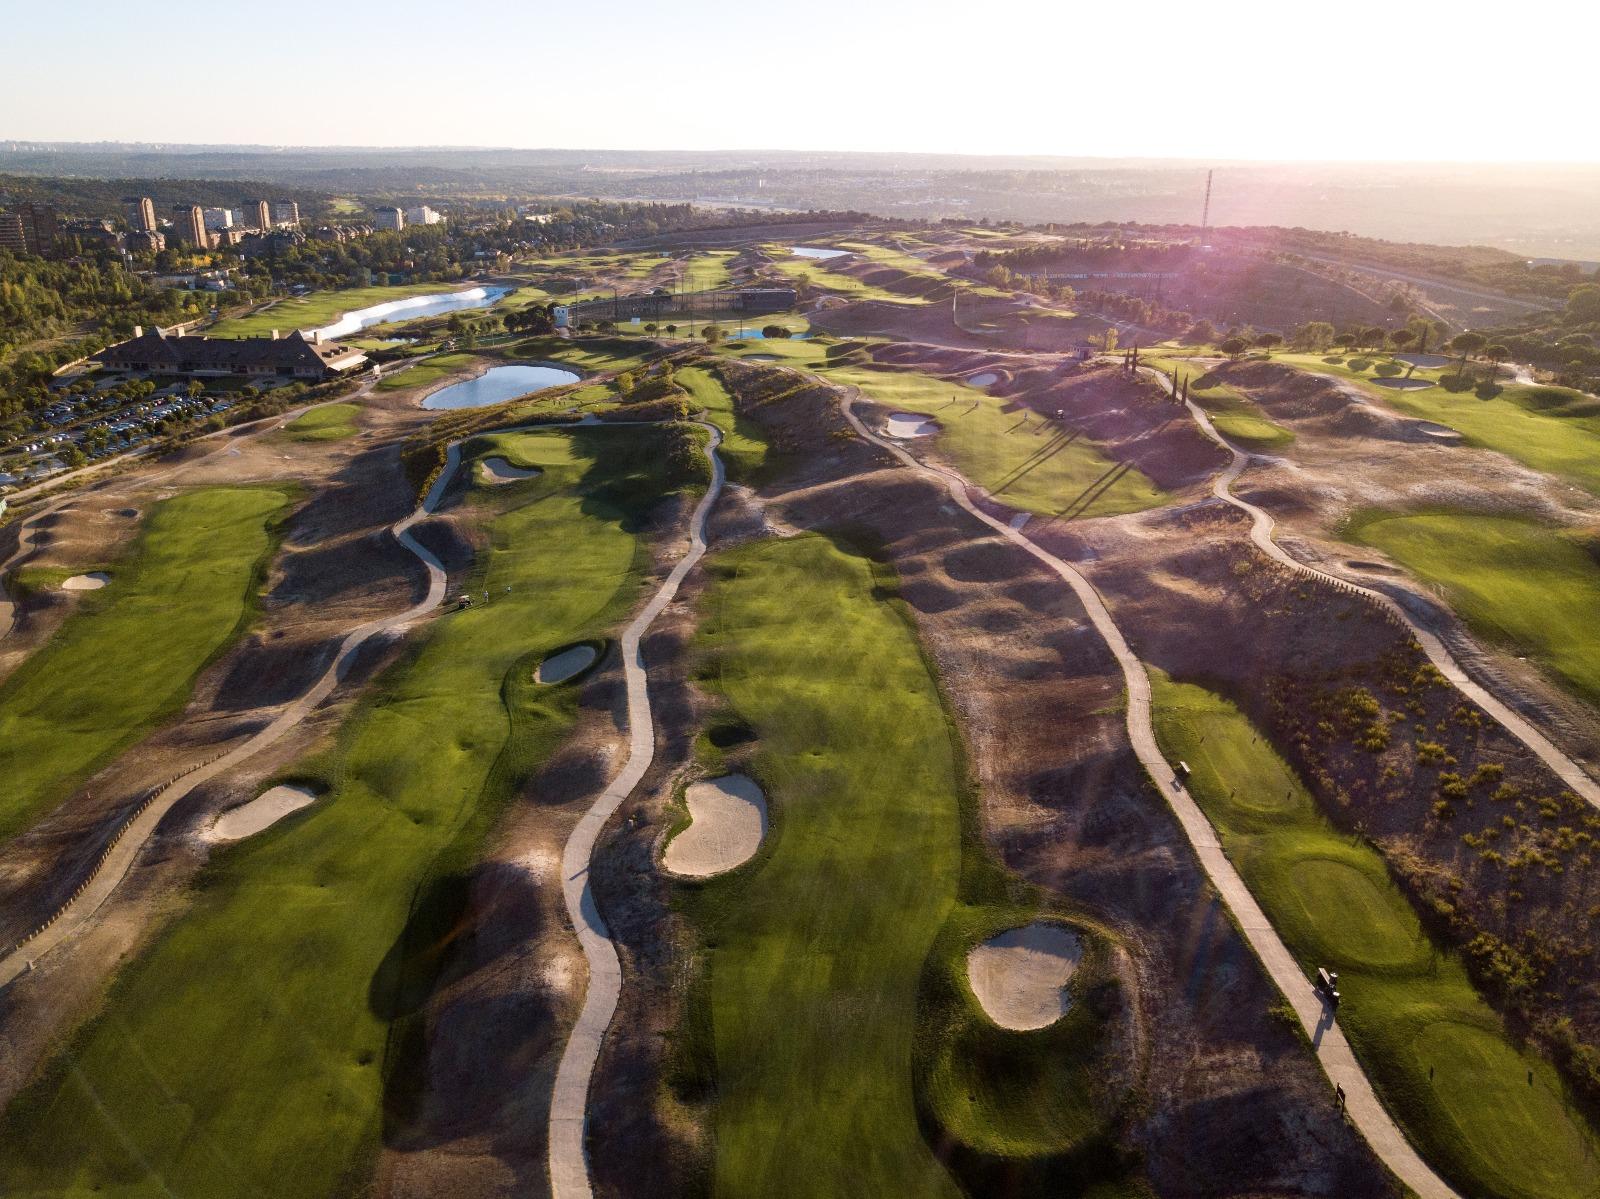 The rise of Centro Nacional de Golf